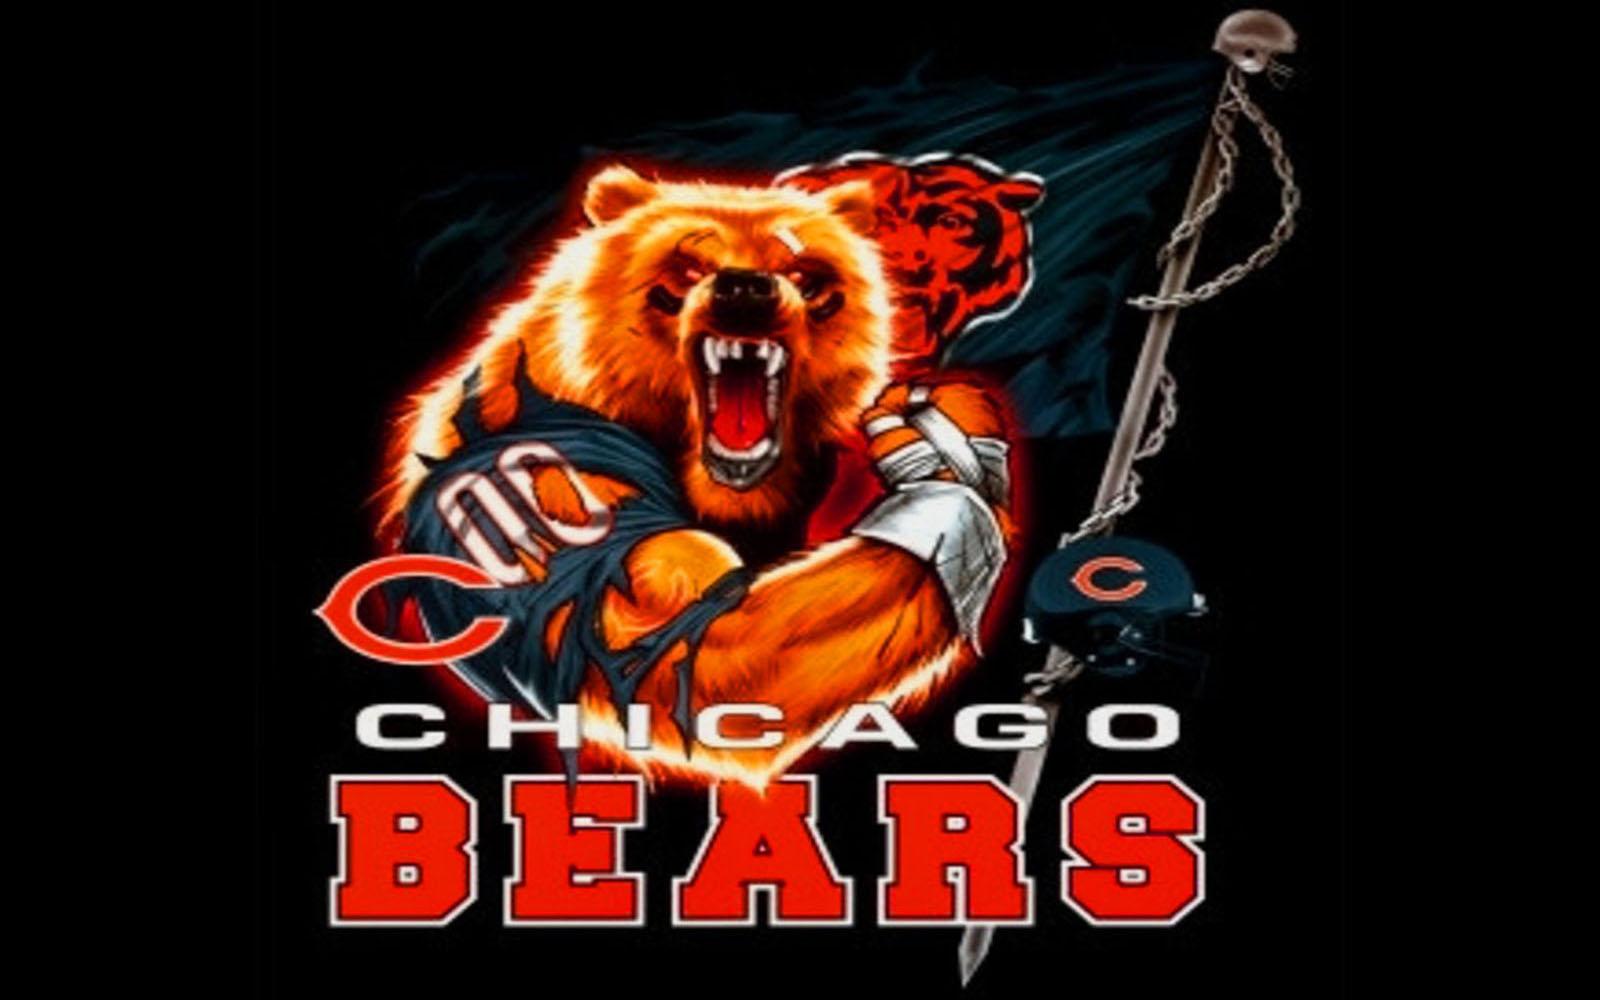 http://3.bp.blogspot.com/-UCuRrZQdaJE/UUocoNjQfsI/AAAAAAAAK4I/k4-9ae1sICc/s1600/Chicago_Bears_2013_NFL_United_States_HD_Desktop_Wallpaper_citiesandteams.blogspot.com.jpg